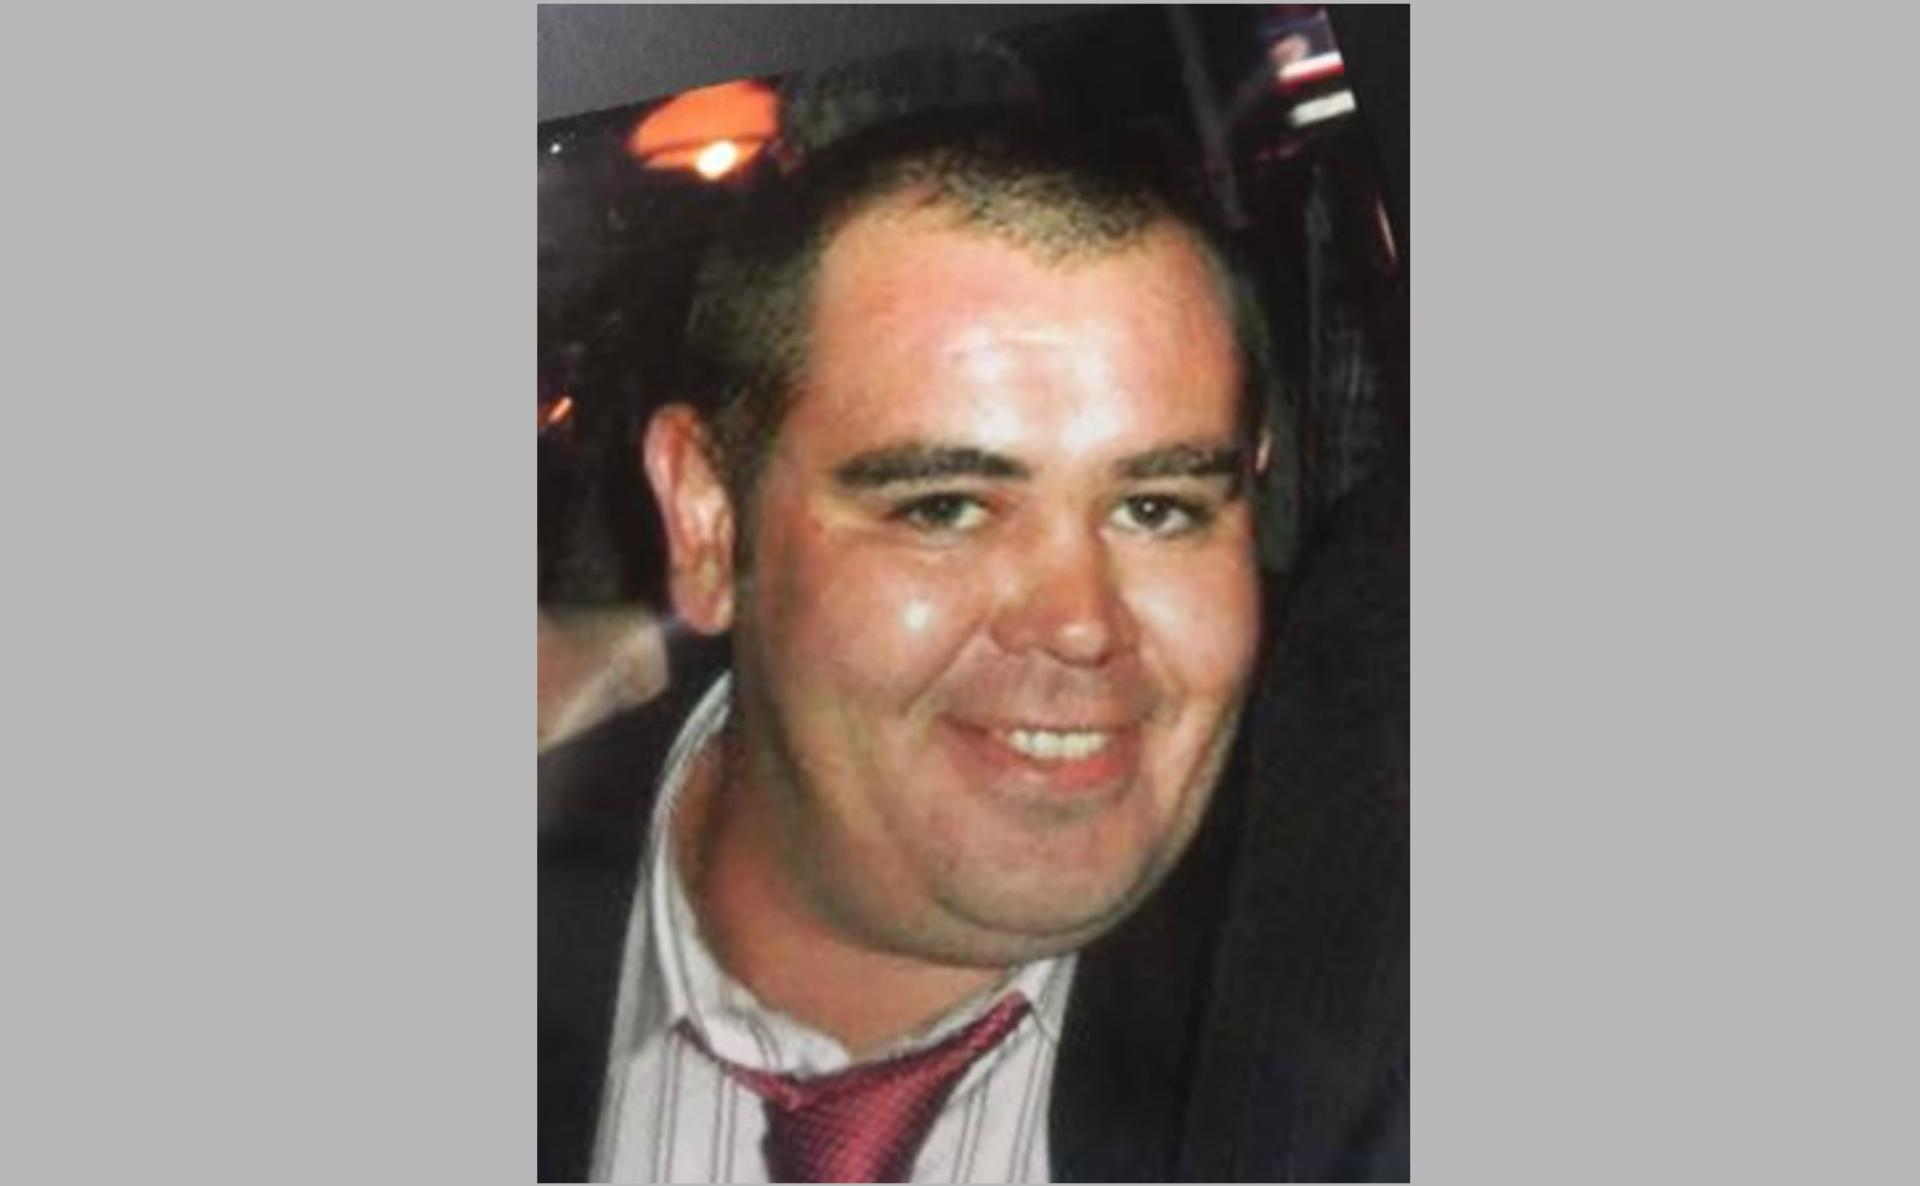 Garda investigating after man threatens Longford shop staff